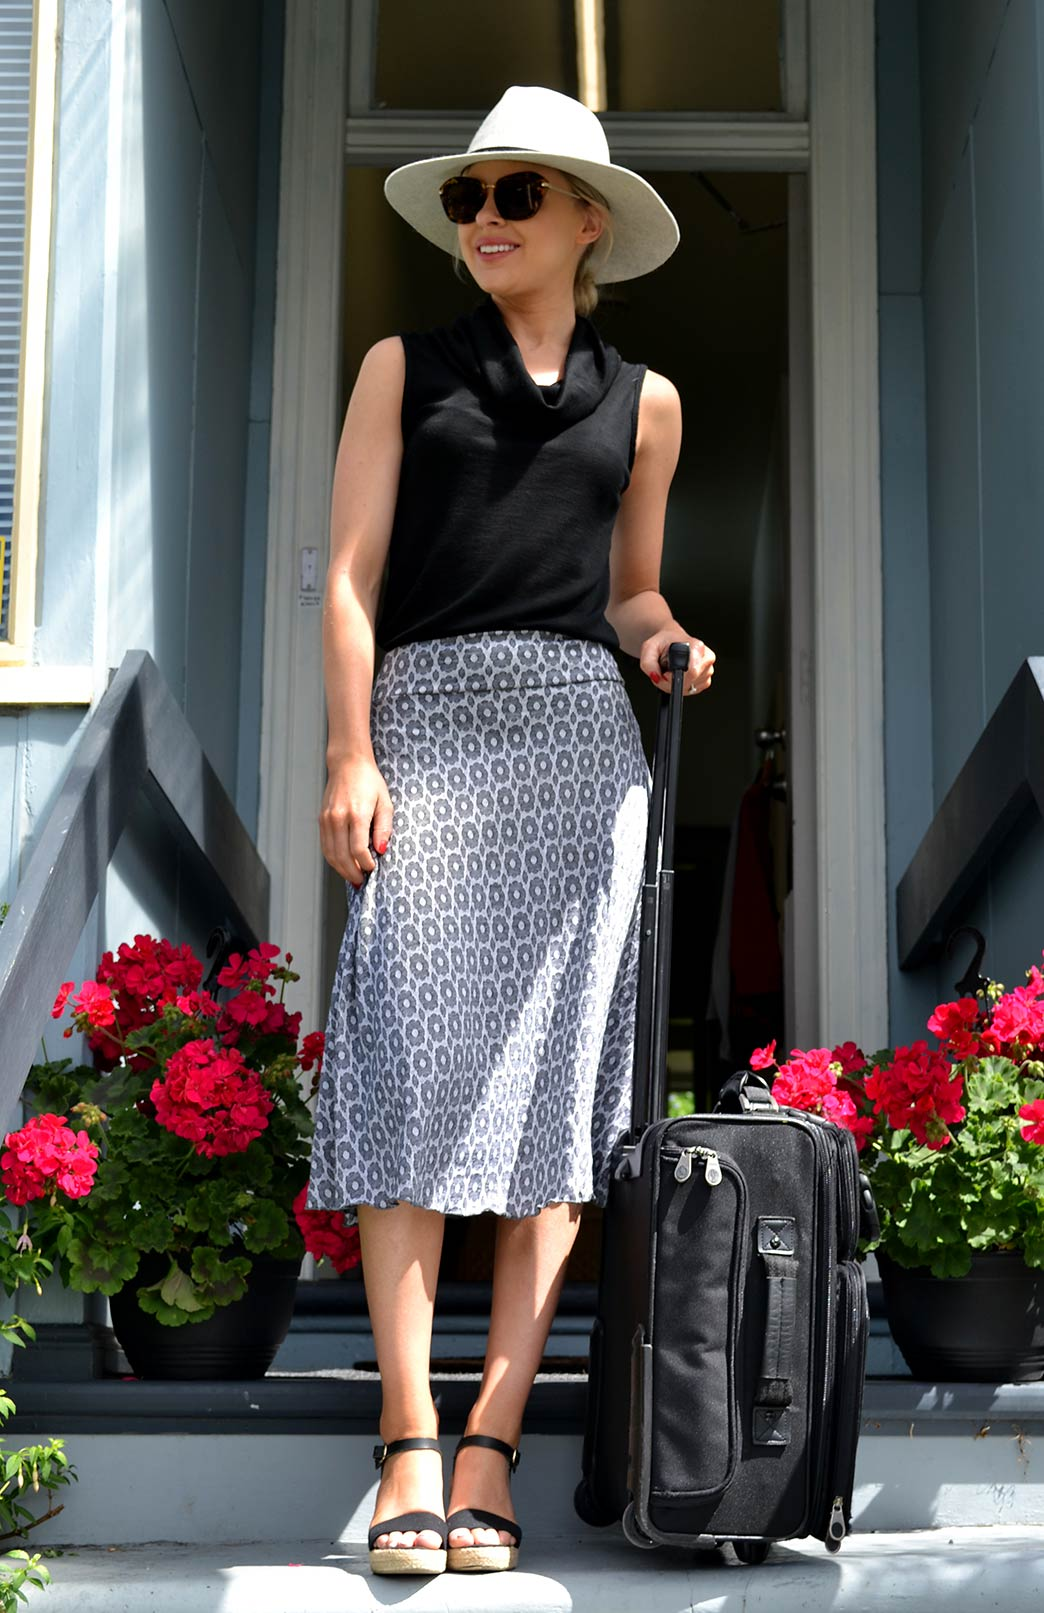 Twirl Skirt - Women's Black A-Line Swing Wool Skirt - Smitten Merino Tasmania Australia